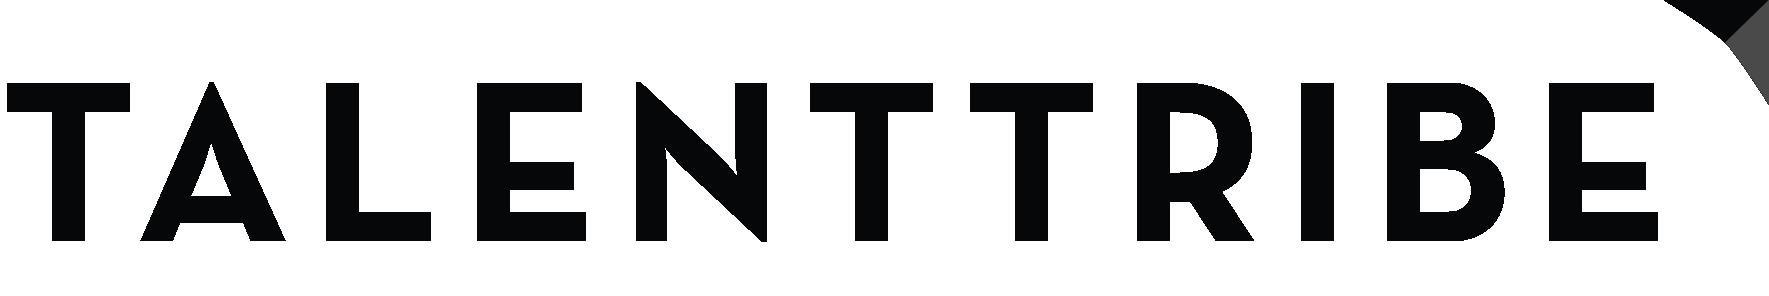 Shopee Logo Png Images Free Download Shopee Icon Free Transparent Png Logos